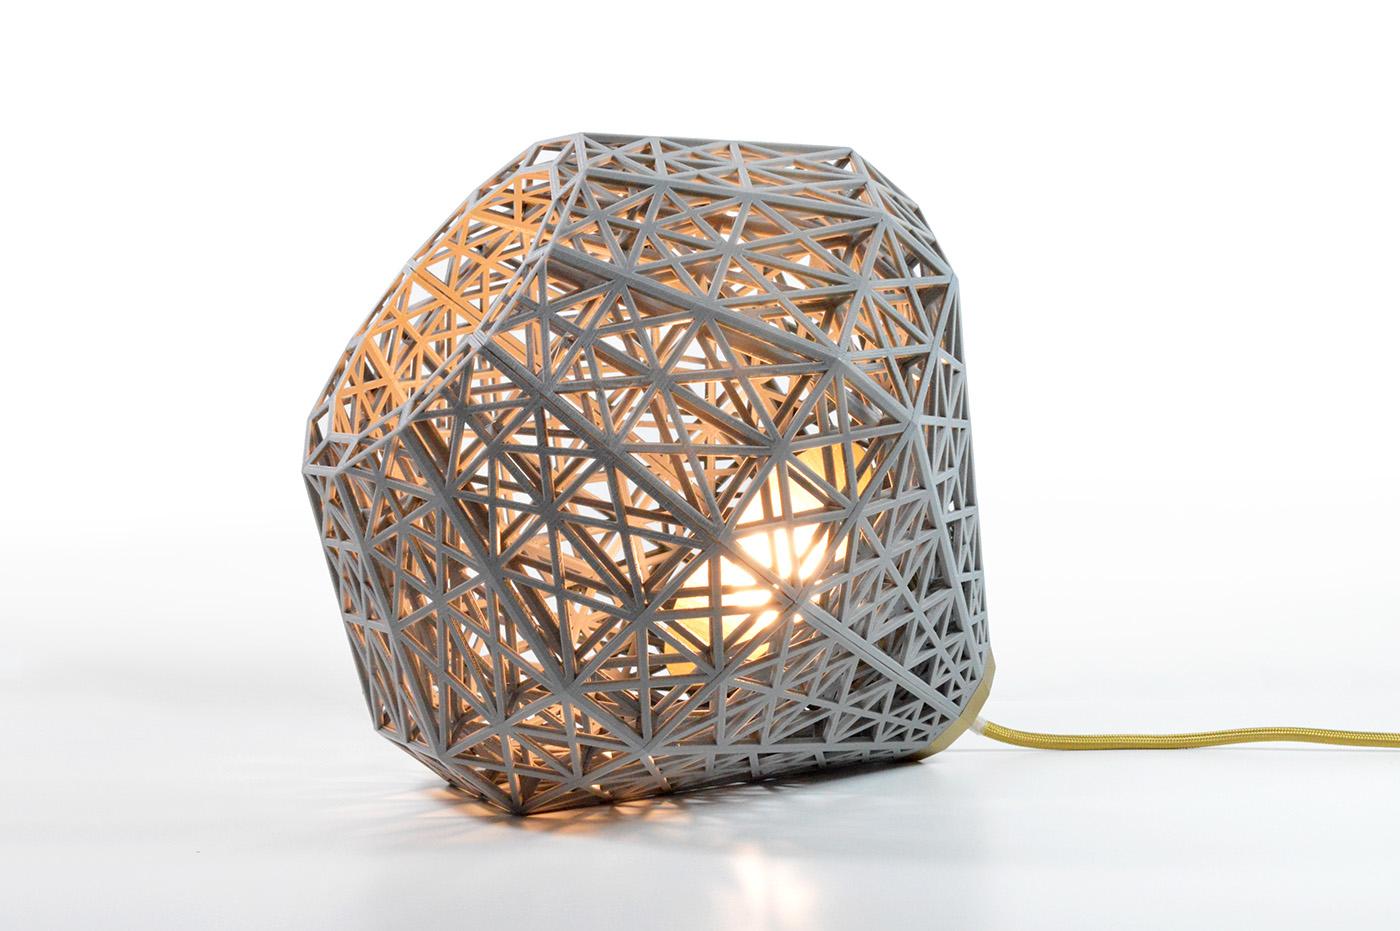 lampe impression 3D samuel bernier